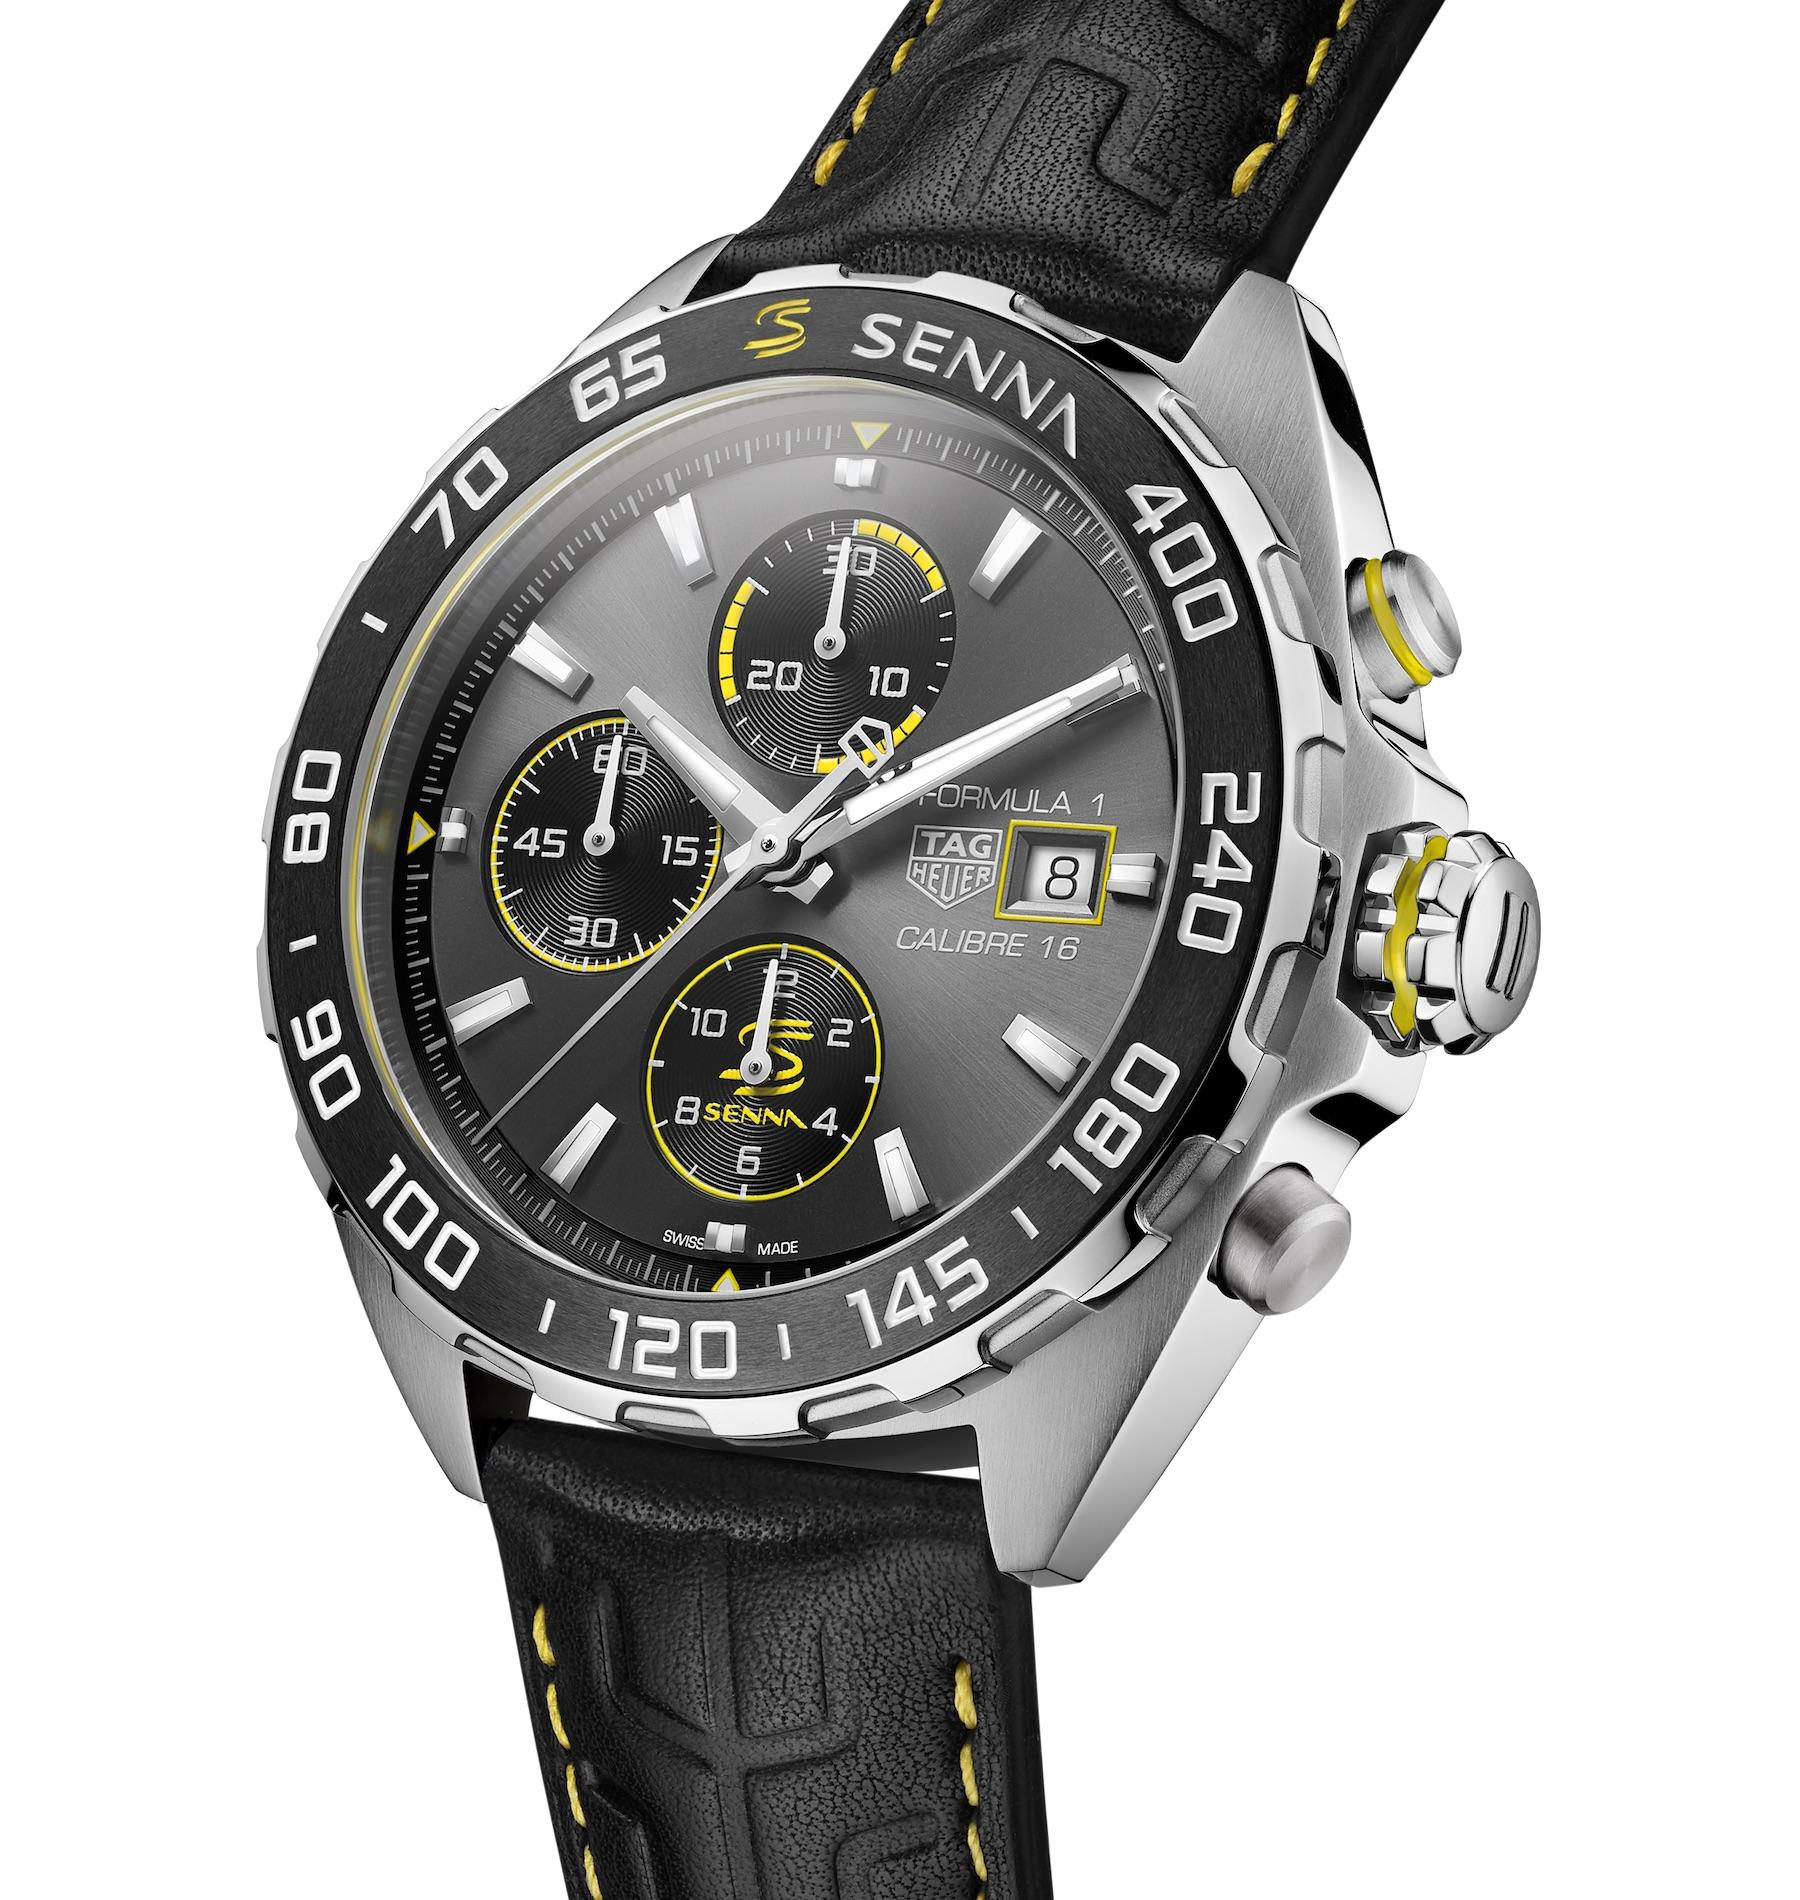 TAG Heuer Formula 1 Senna Special Edition 2020 automatic chronograph